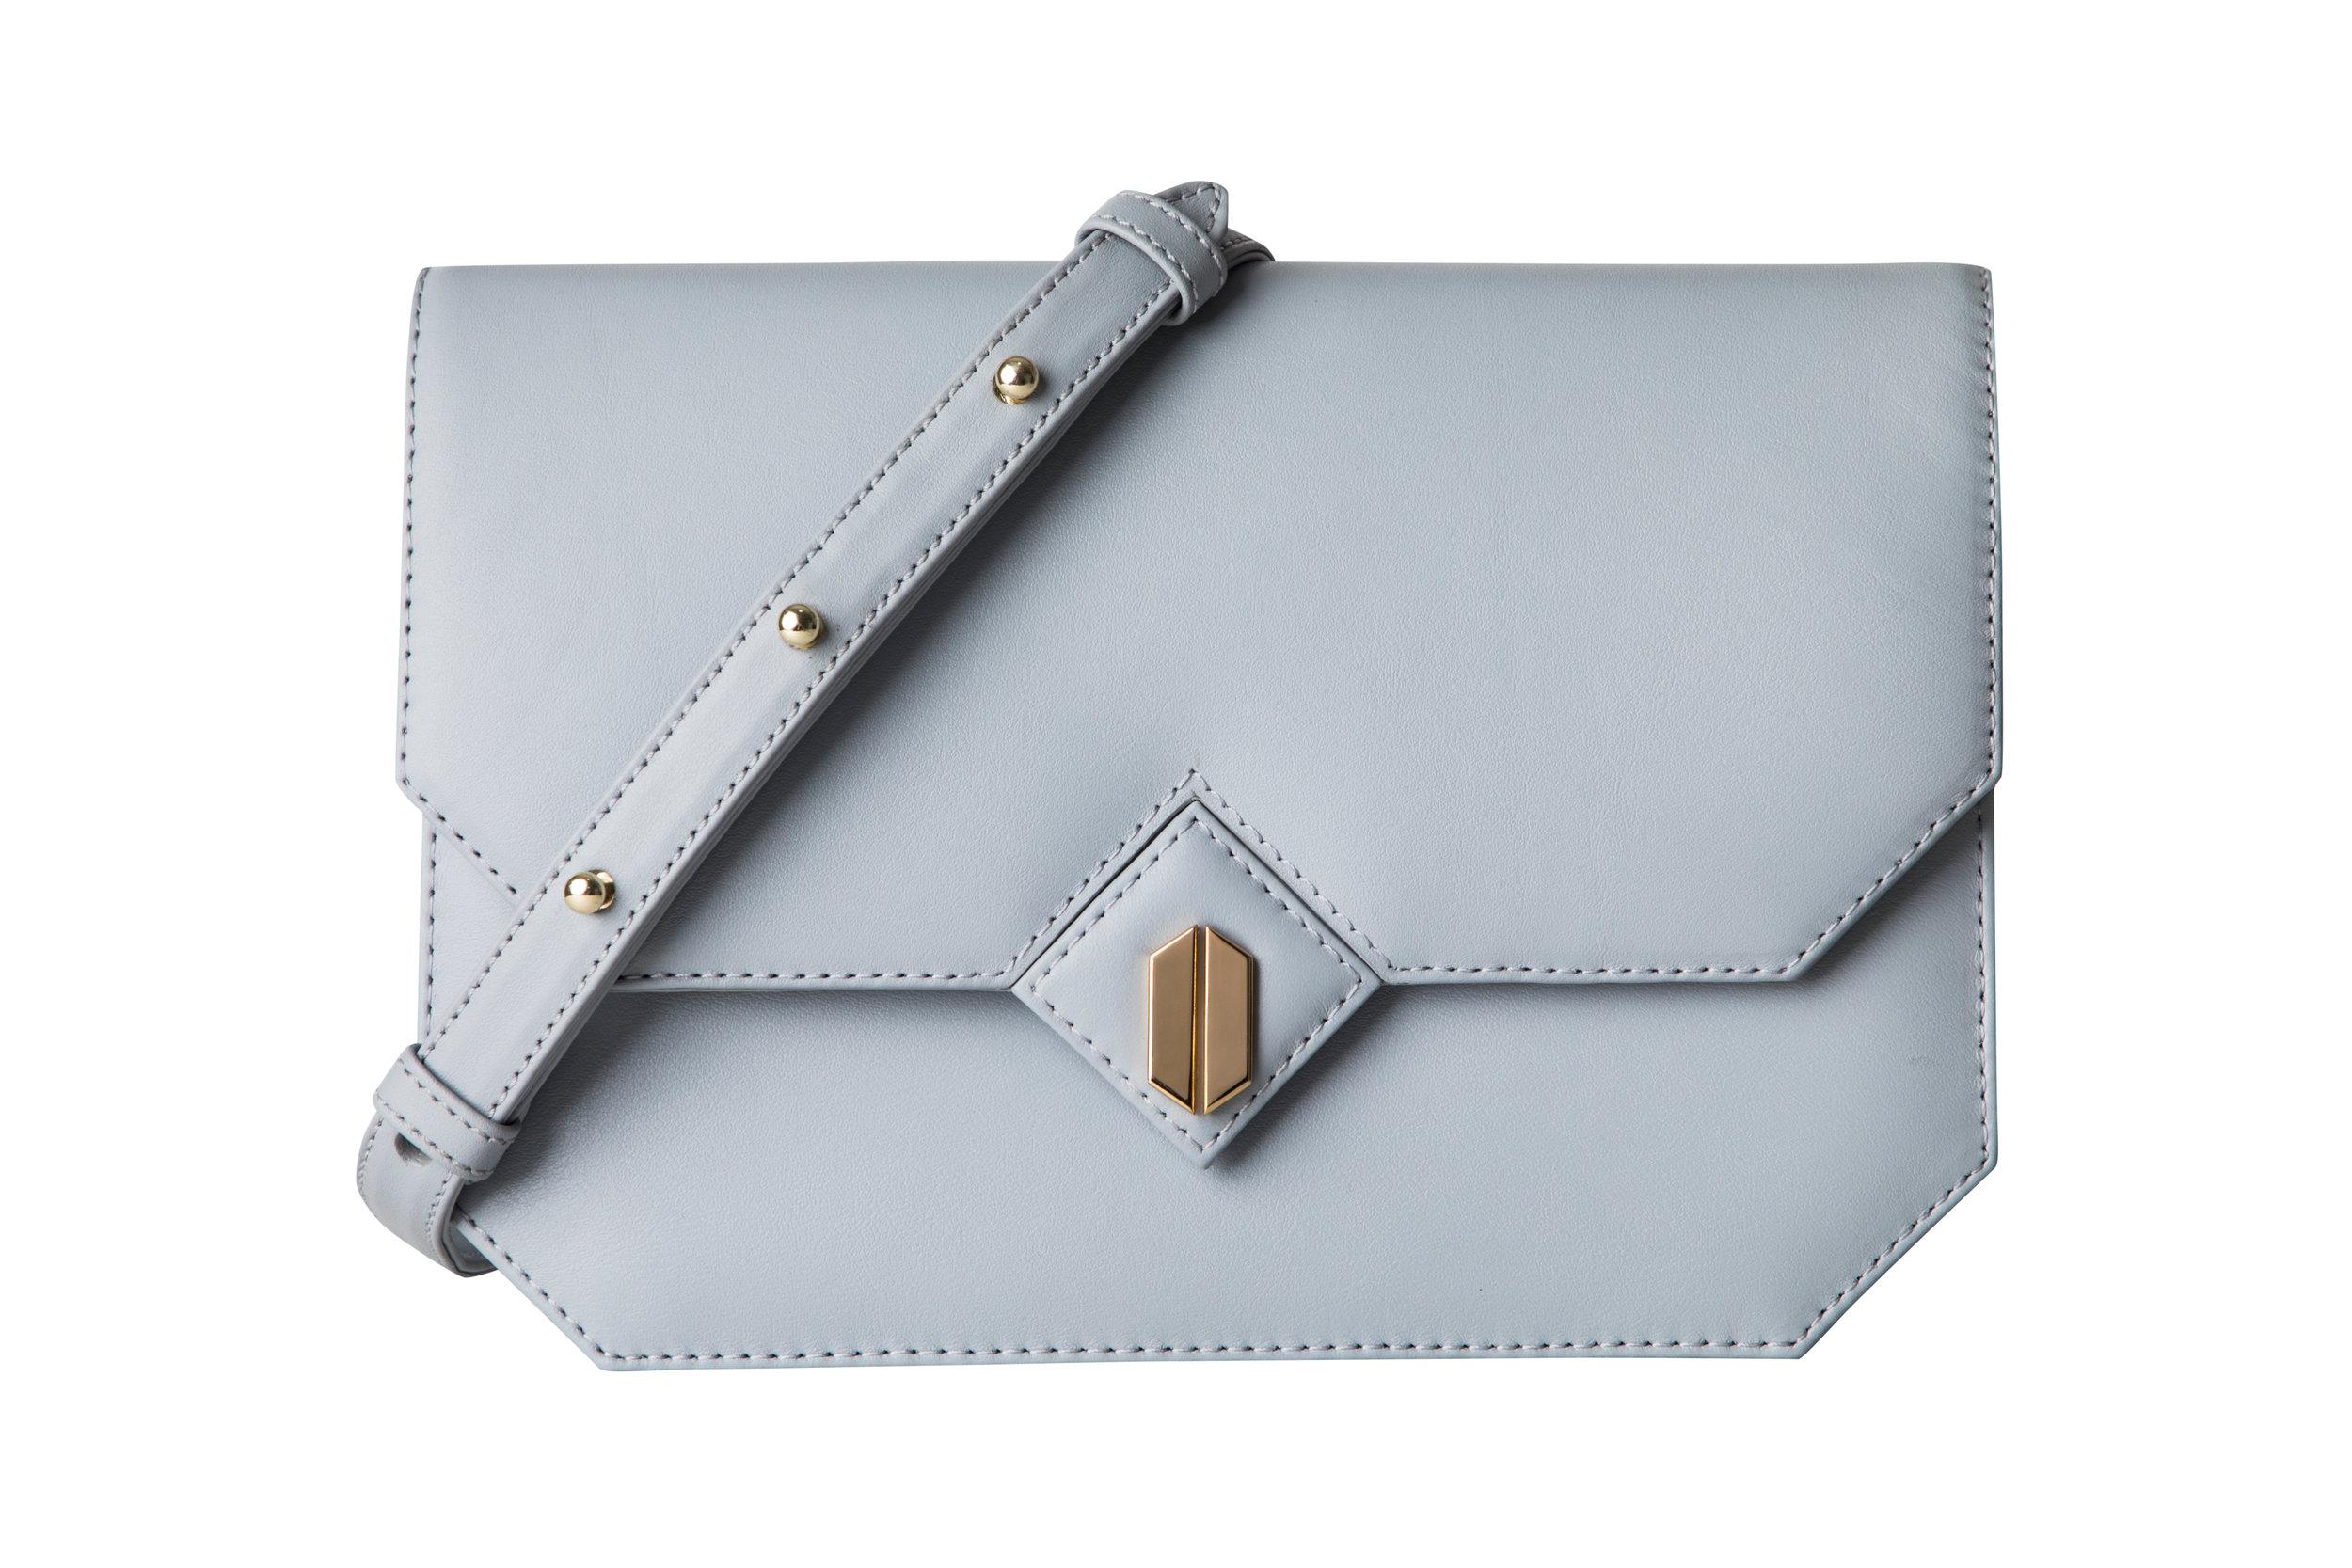 Galatea Bag in Sky Blue $445 USD